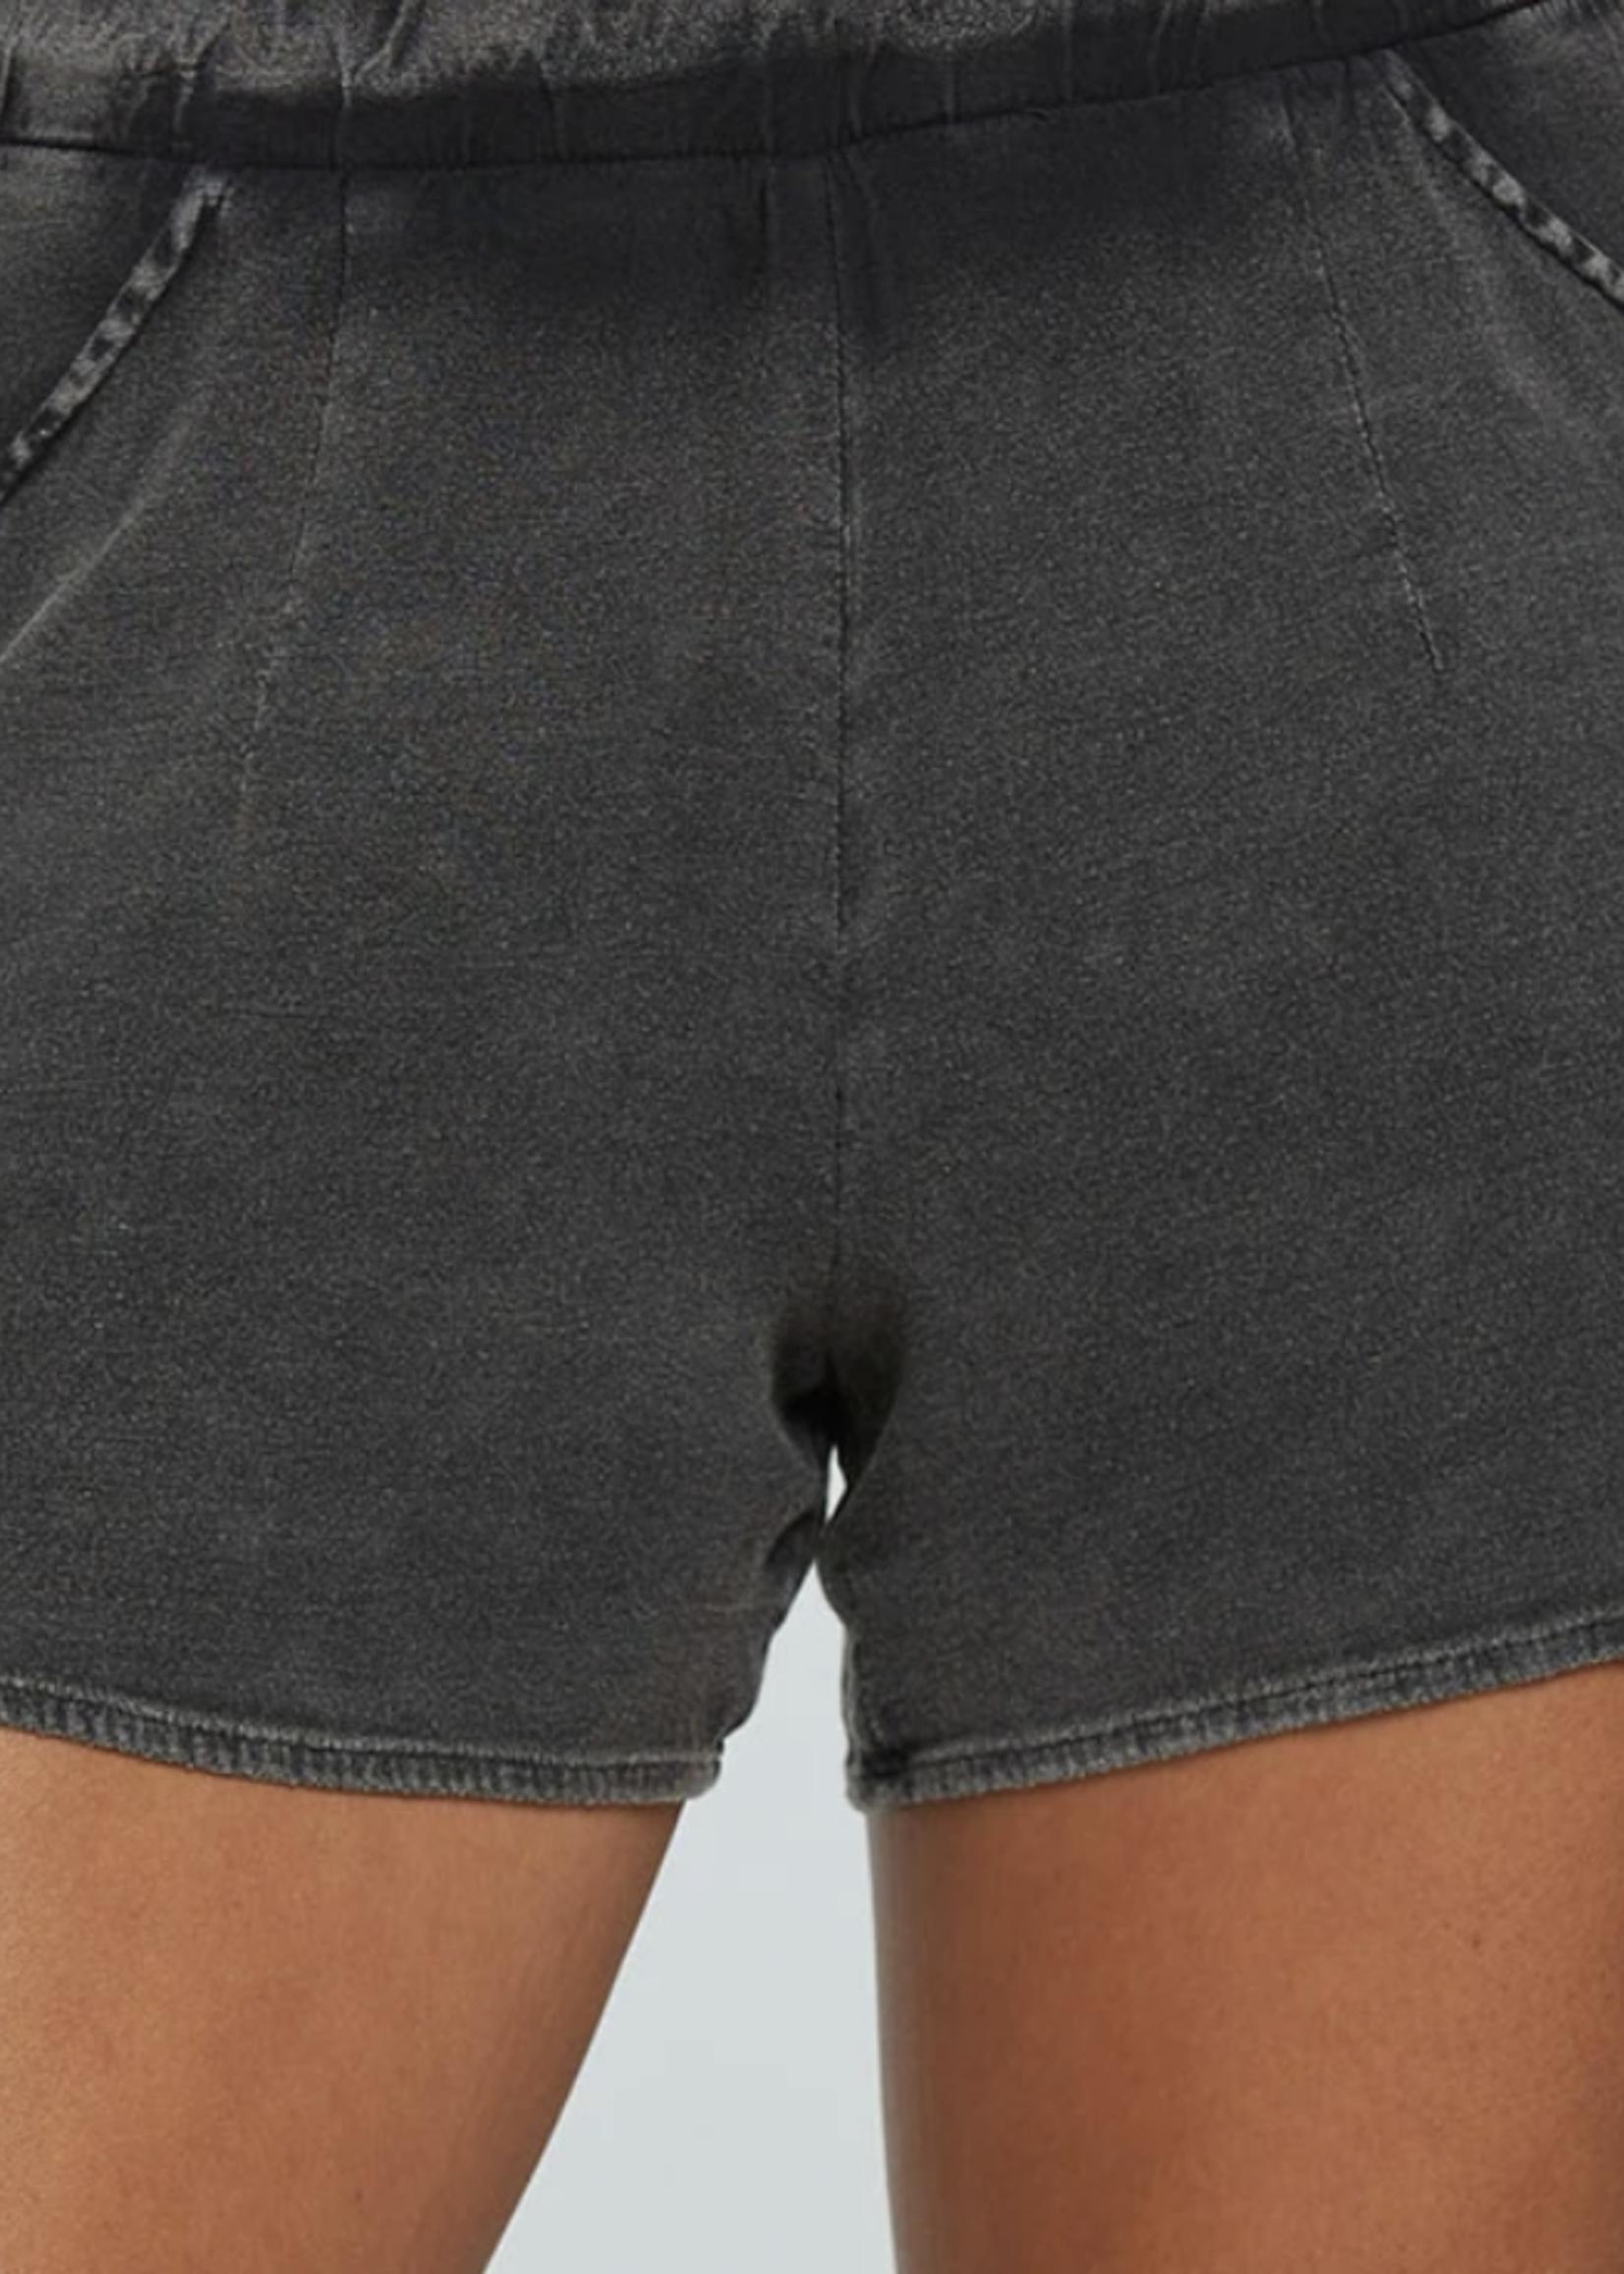 Chaser Cloud Wash Tulip Shorts